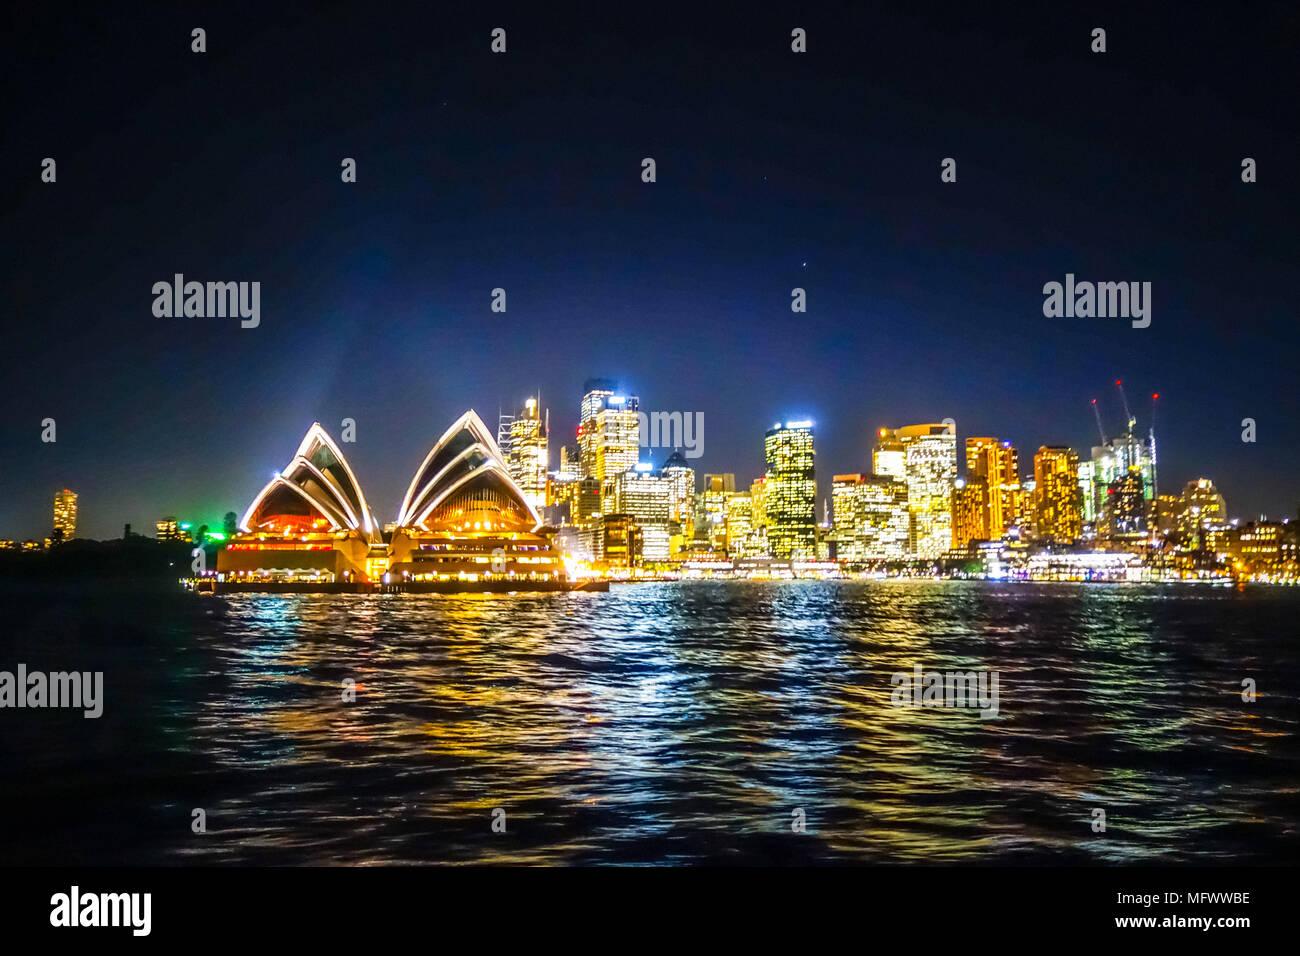 Sydney city and opera house at night, Australia - Stock Image